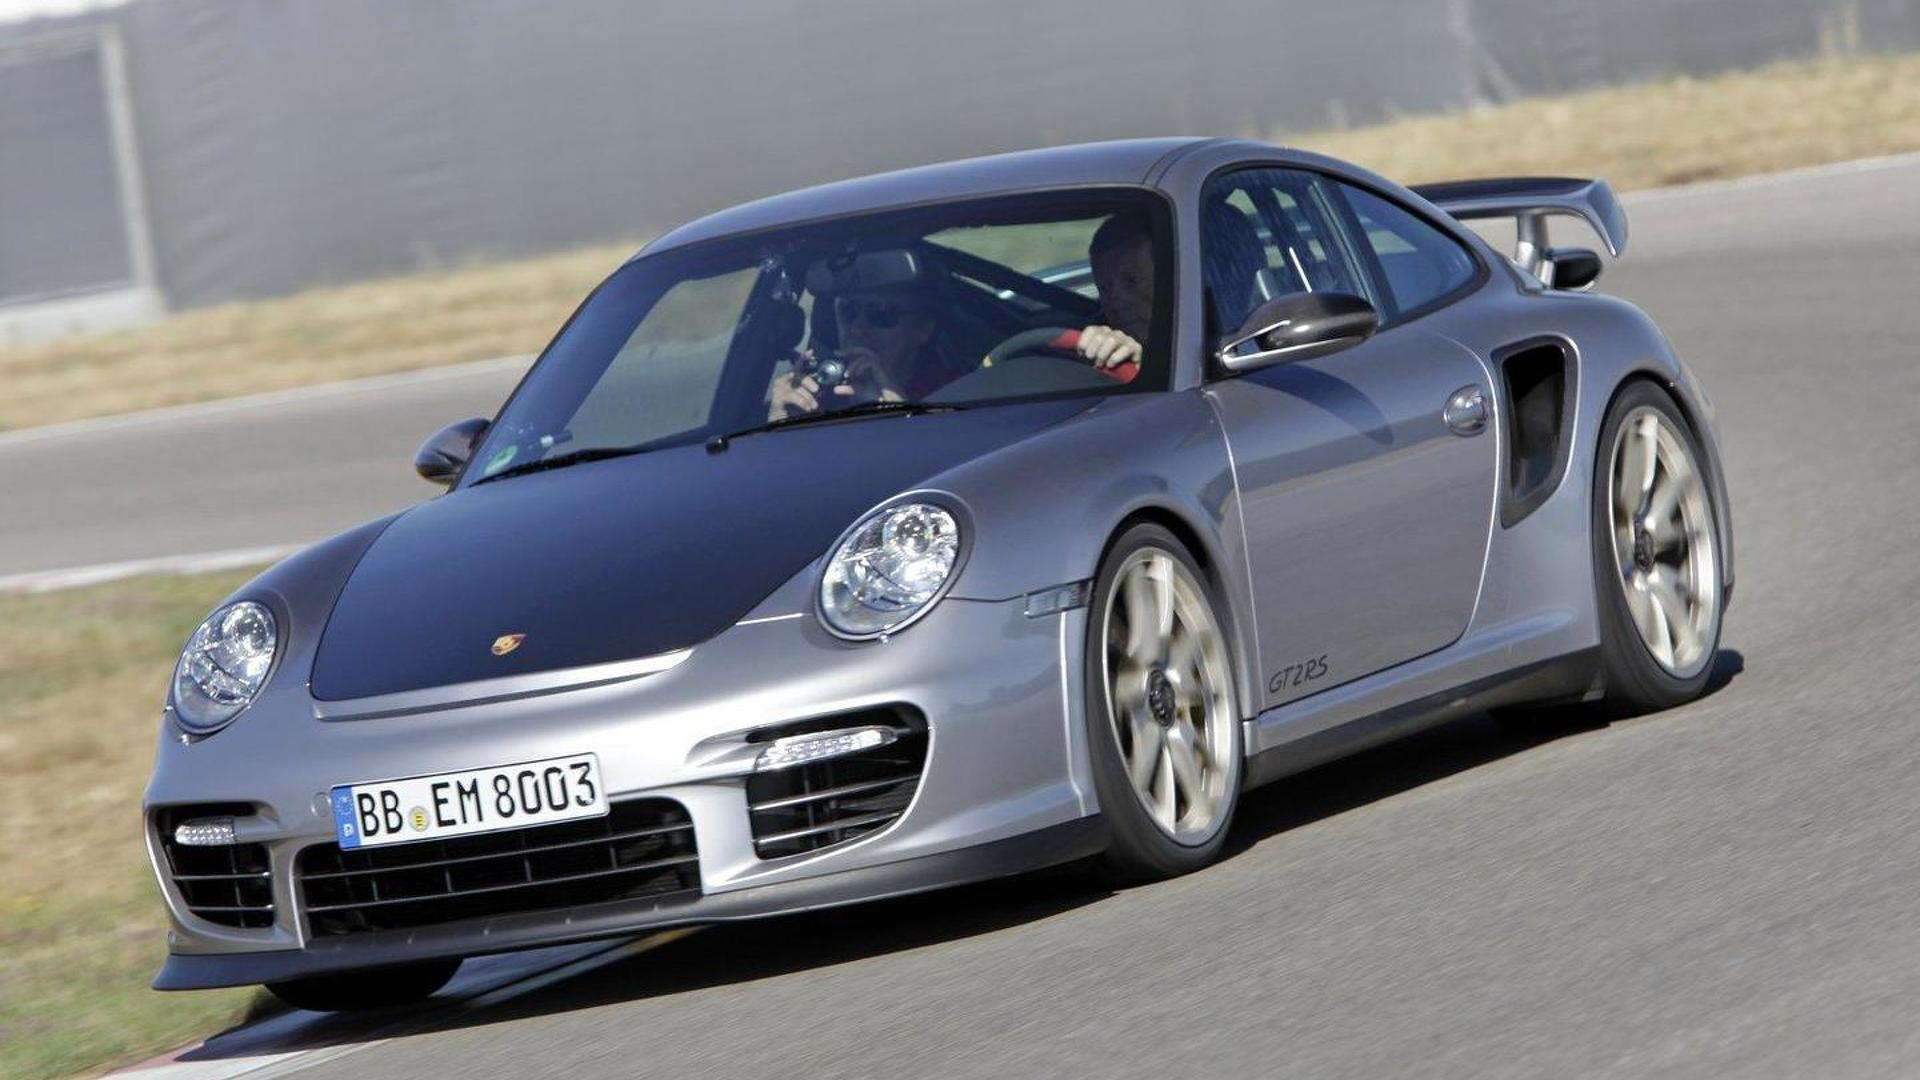 2011-227063-2011-porsche-911-gt2-rs-11-03-20111 Stunning Porsche 911 Gt2 Rs Vs Lamborghini Aventador Cars Trend